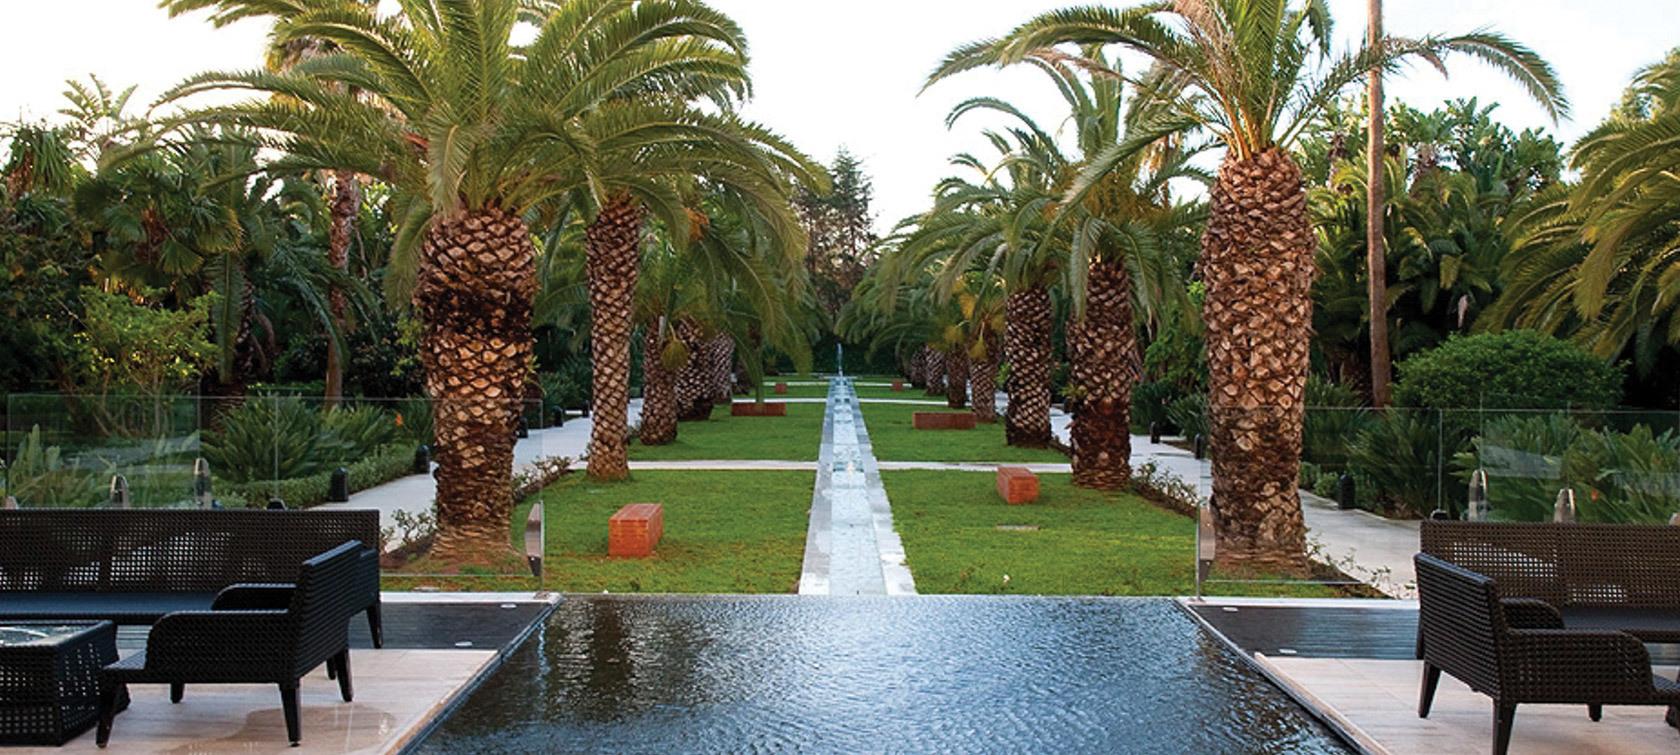 Sofitel Jardin des Roses, Rabat